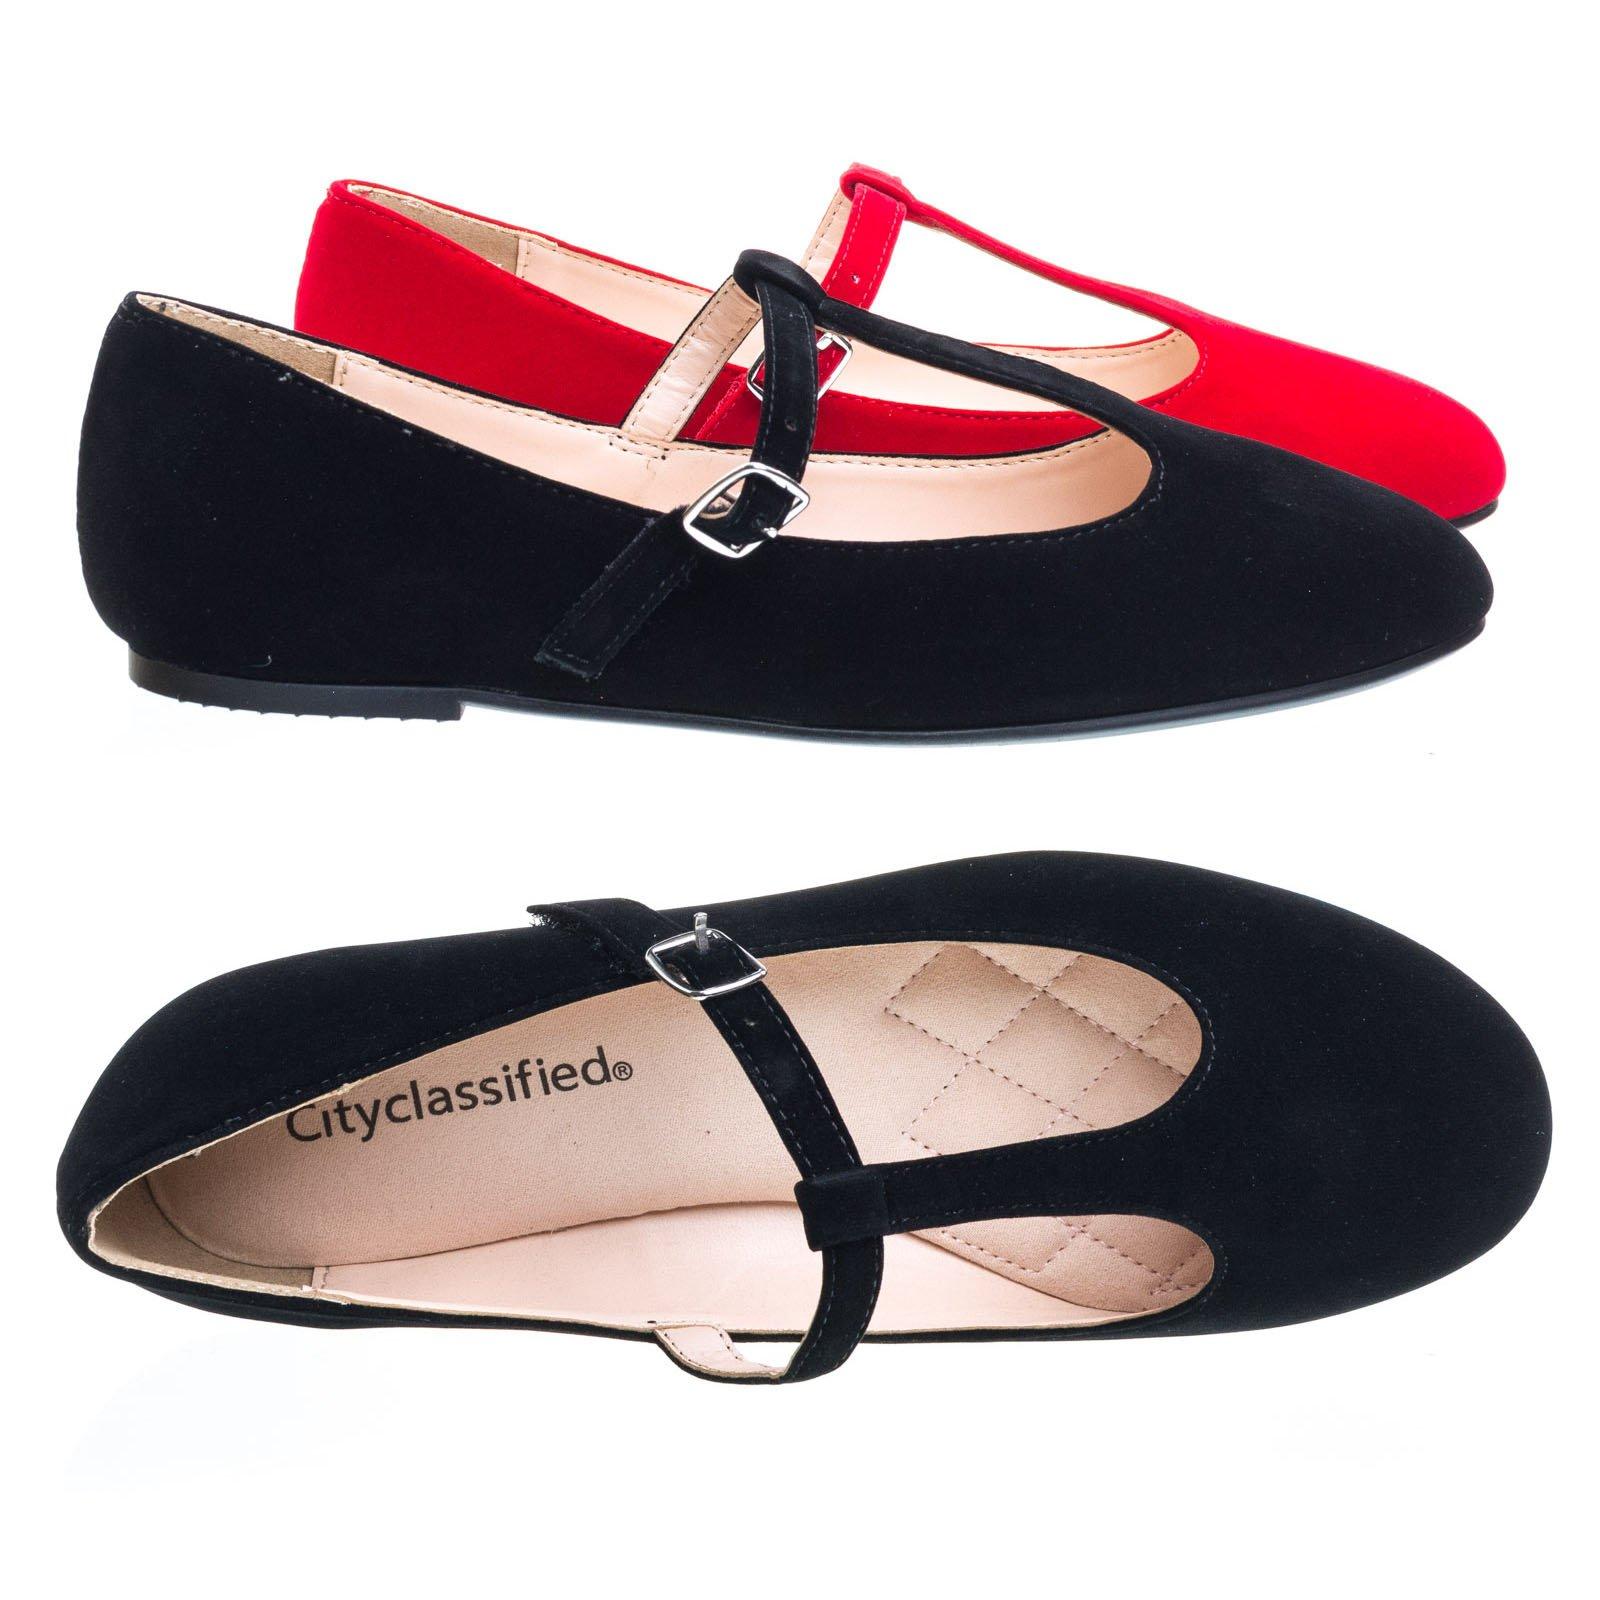 City Classified Laura D-Black Ballet T-Strap Mary-Jane Flats. Women's Ballerina Round Toe Comfort Flats -7.5